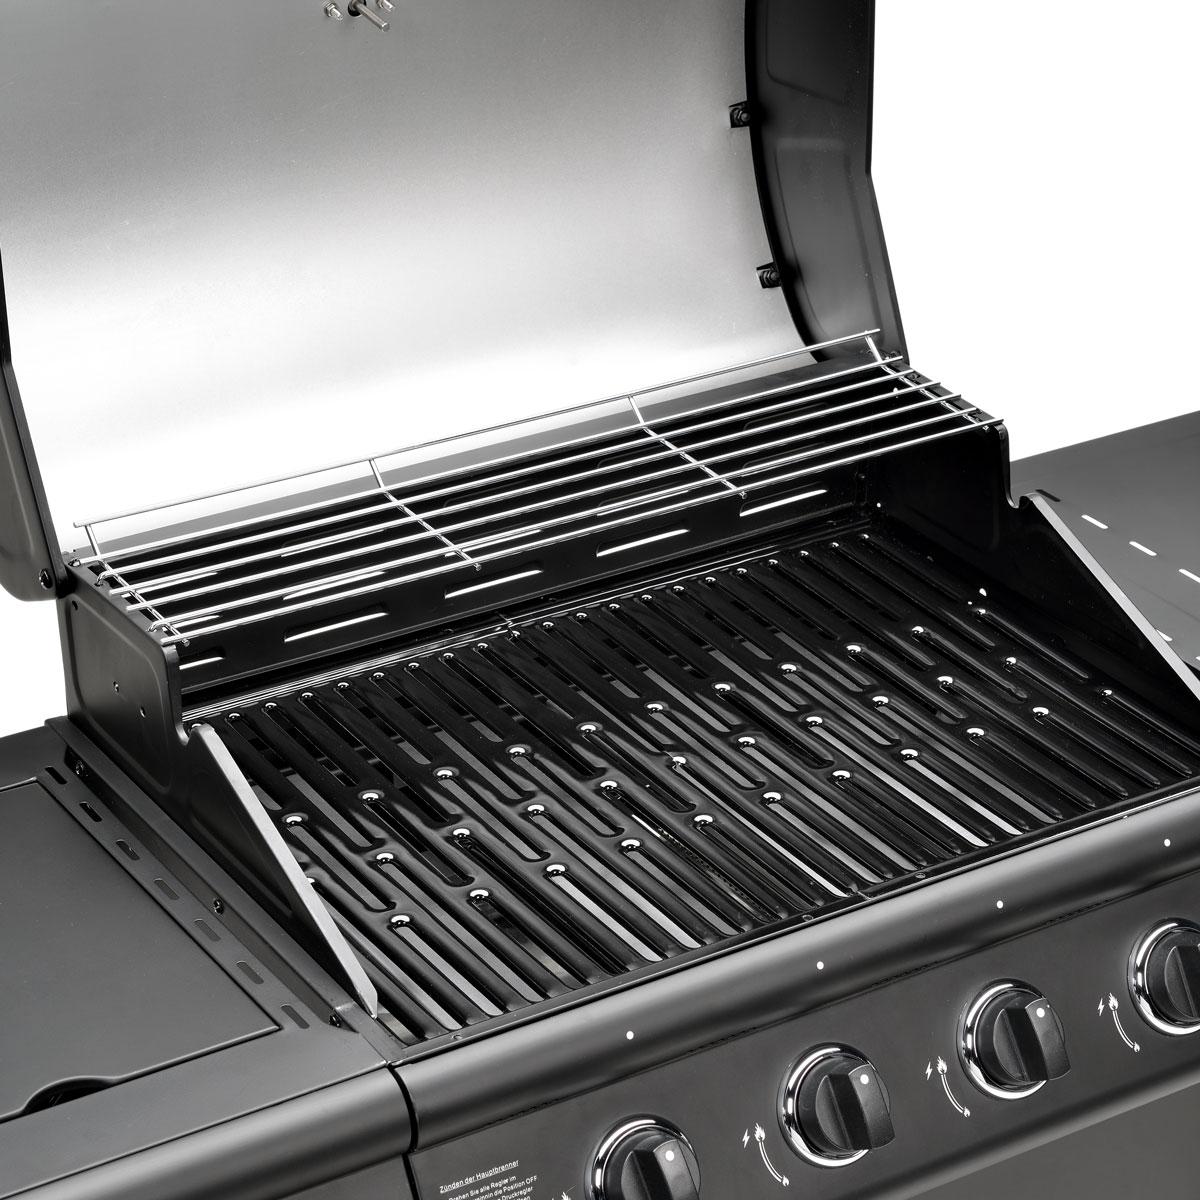 gasgrill bbq grillwagen 4 edelstahl brenner gas grill seitenkocher neu schwarz ebay. Black Bedroom Furniture Sets. Home Design Ideas